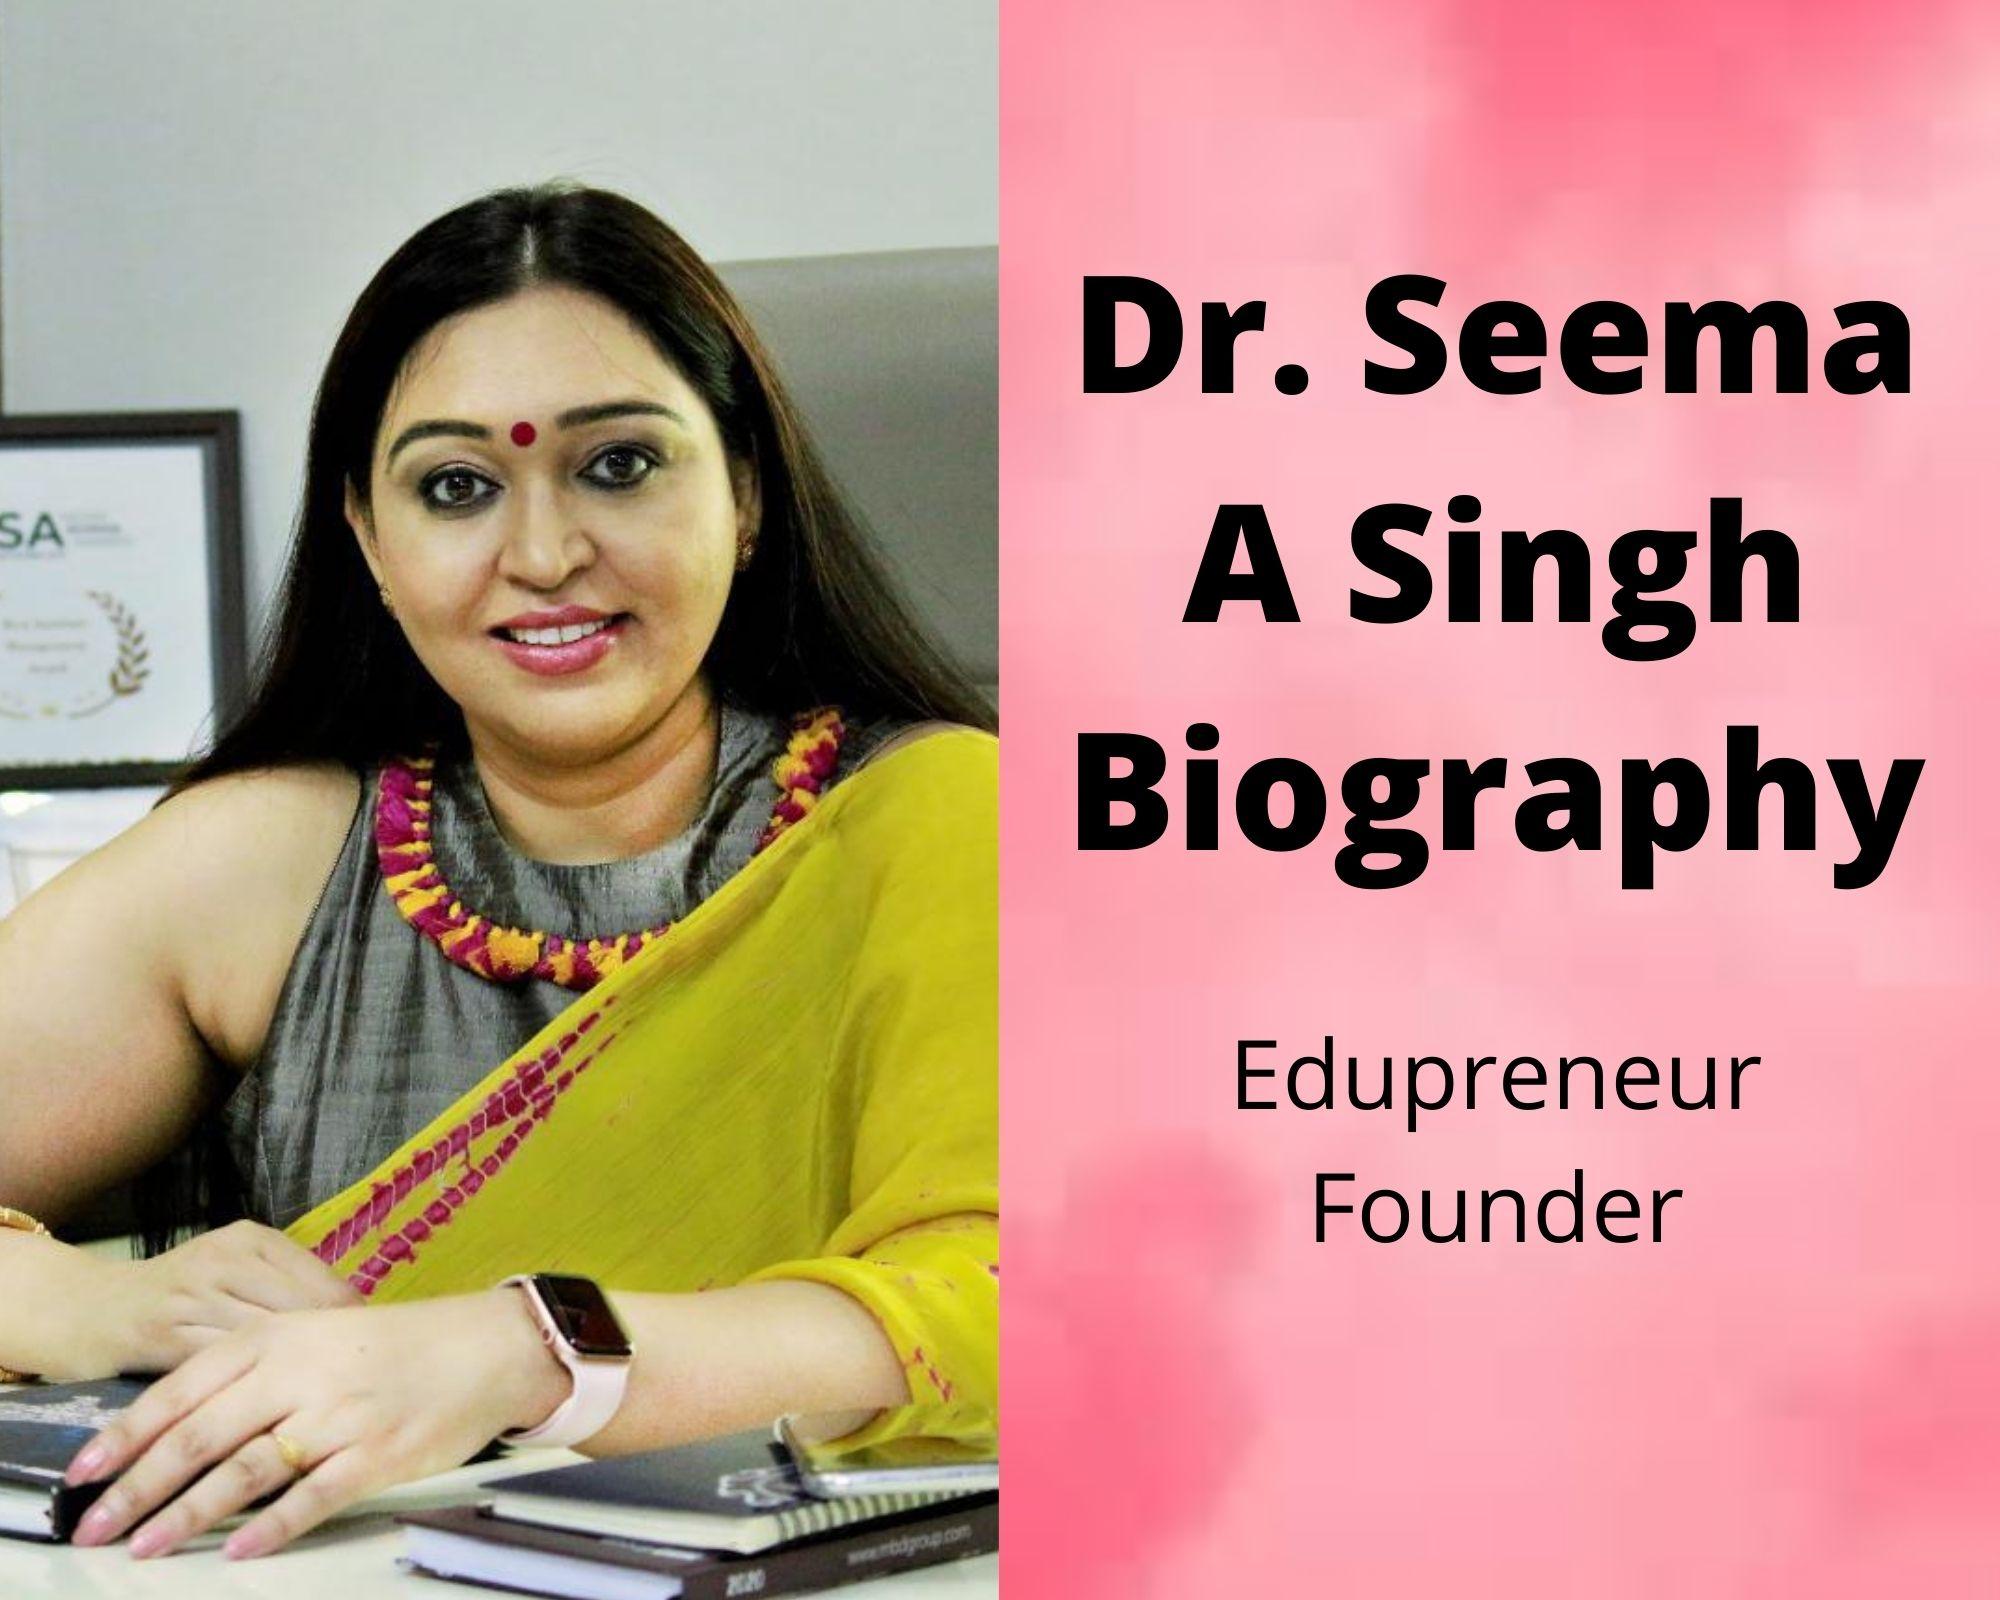 Dr. Seema A Singh Biography